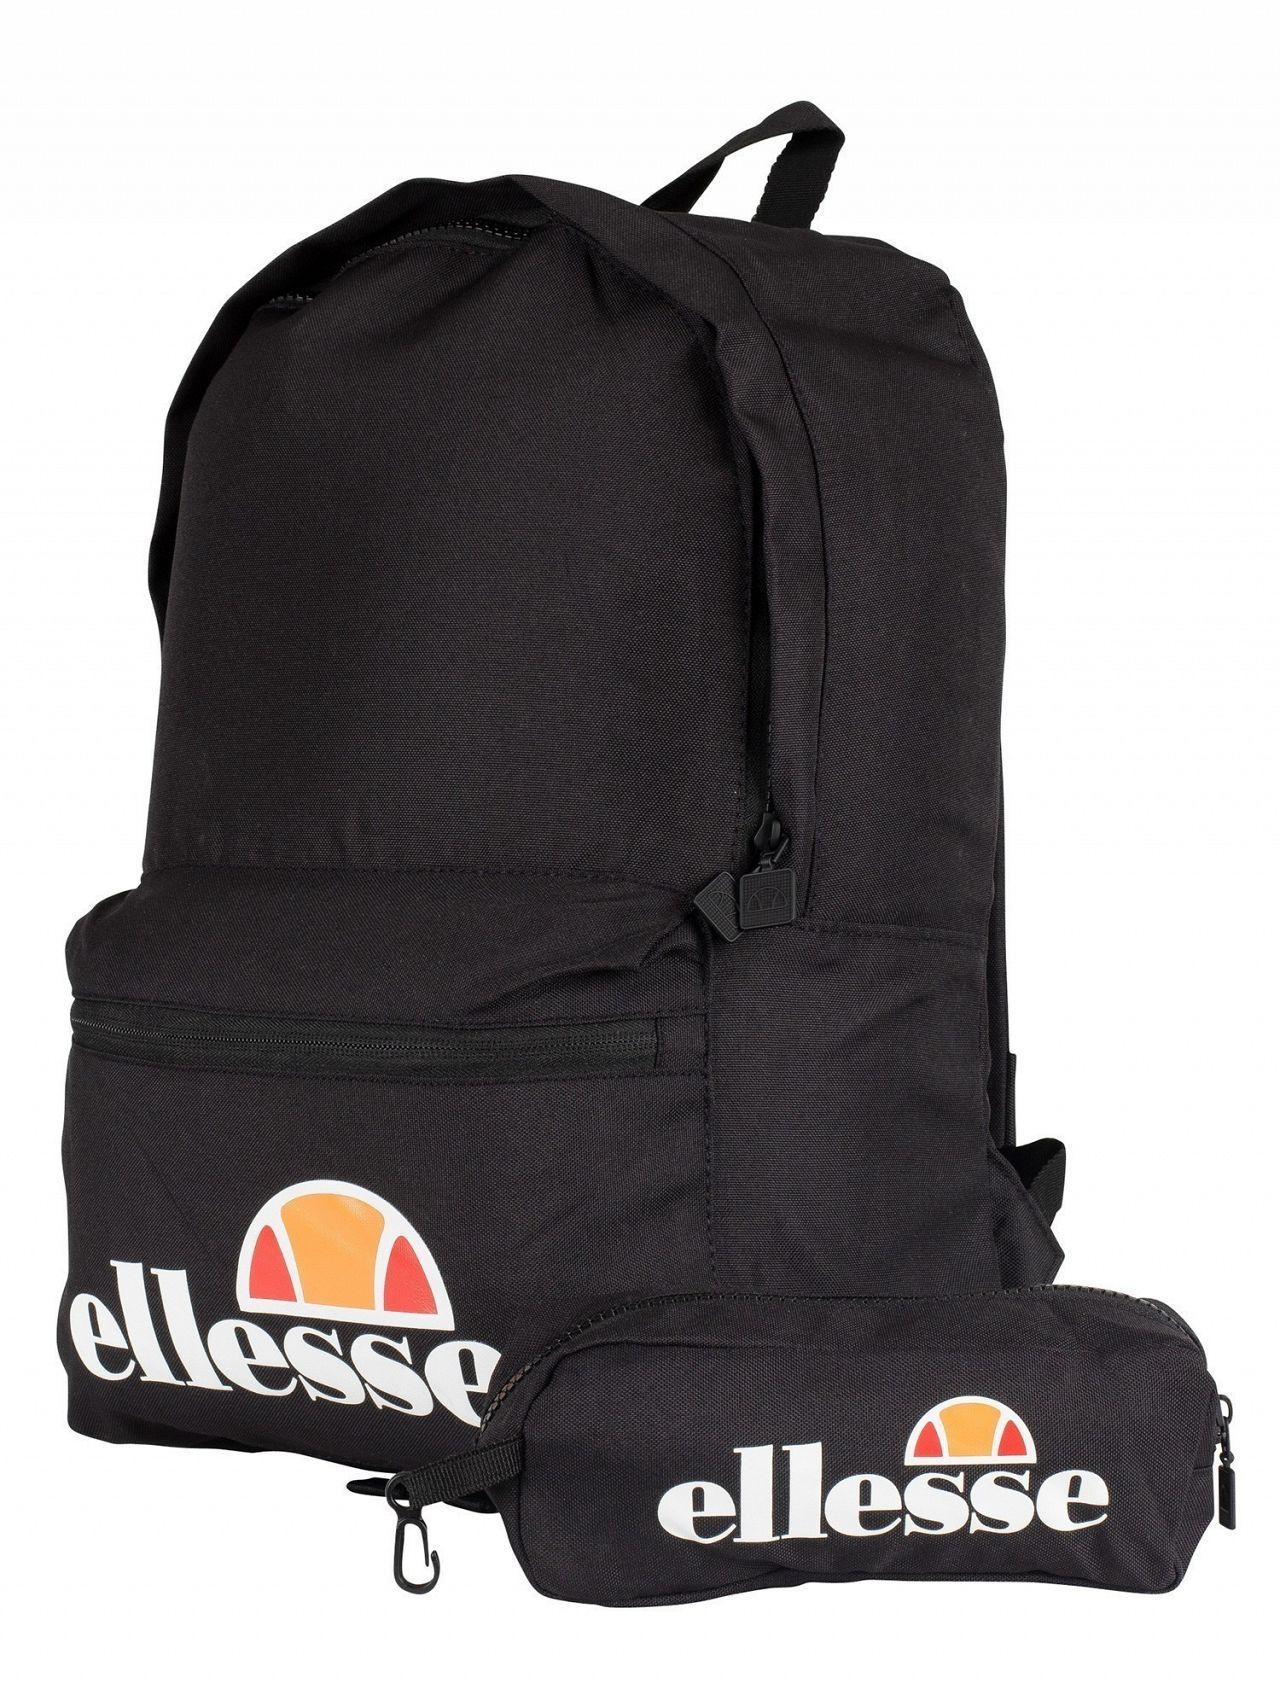 204b16d476 Ellesse - Black Rolby Backpack   Pencil Case for Men - Lyst. View fullscreen